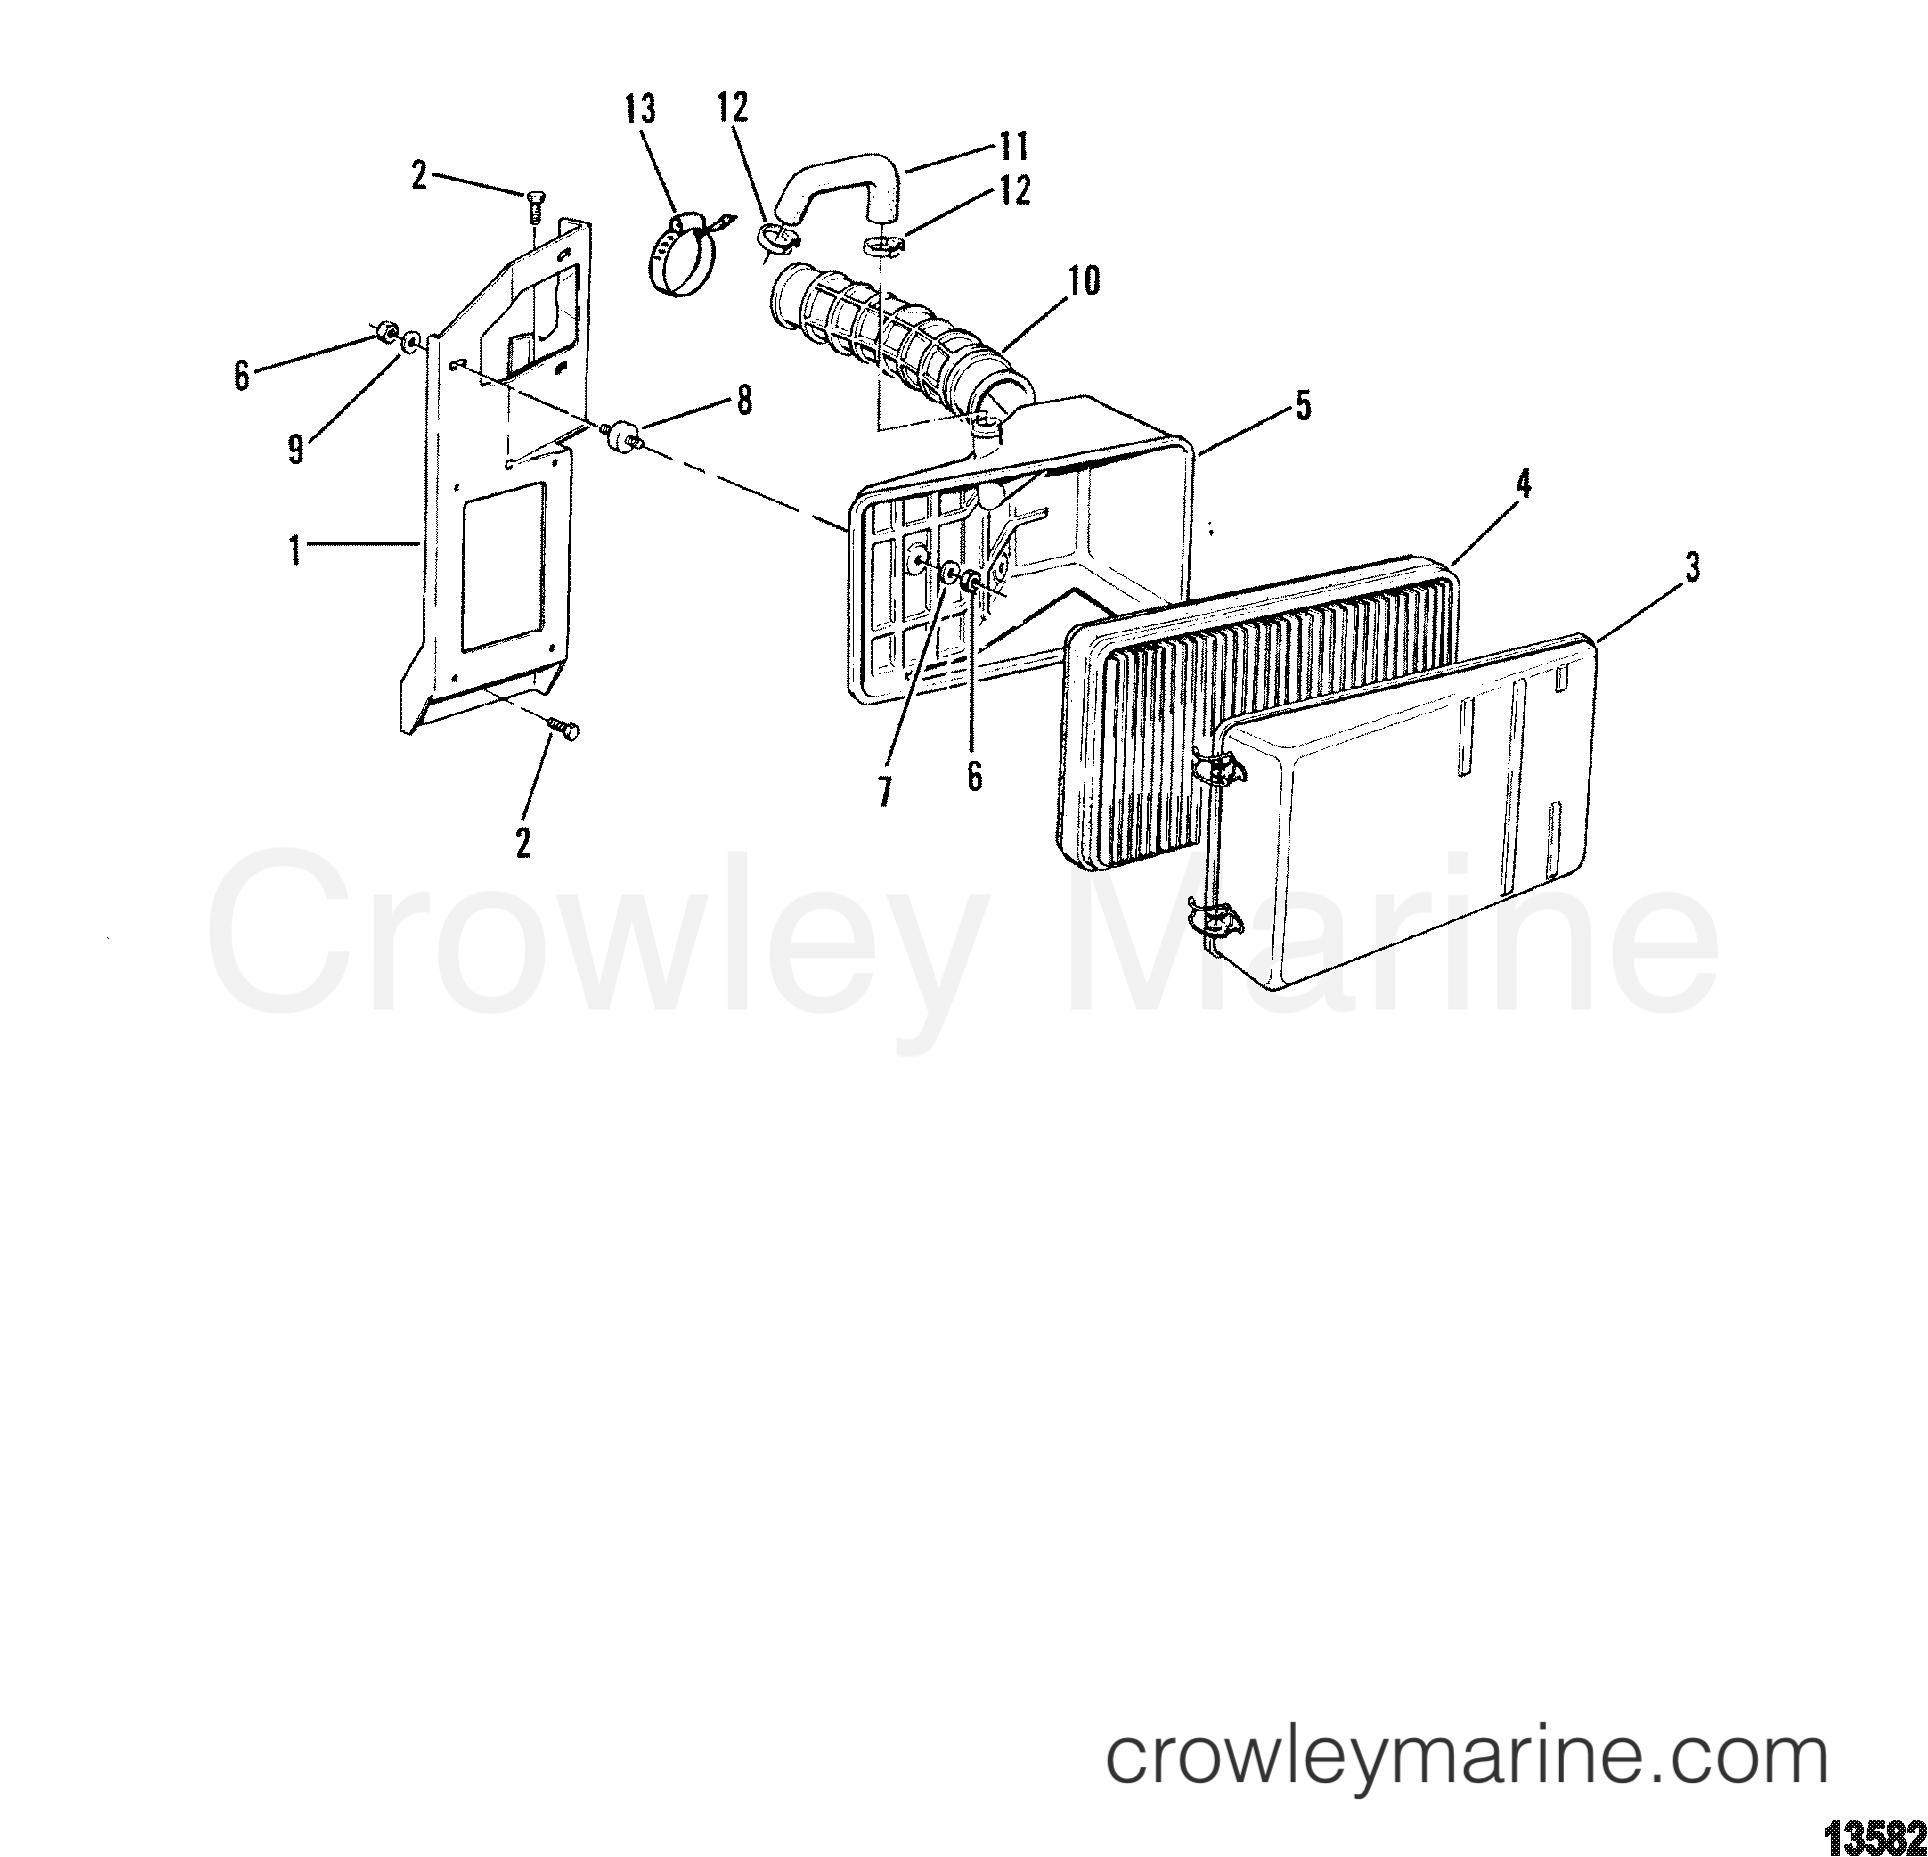 1993 Mercruiser 530D [BRAVO] - 430B1103D AIR CLEANER(OLD DESIGN) section